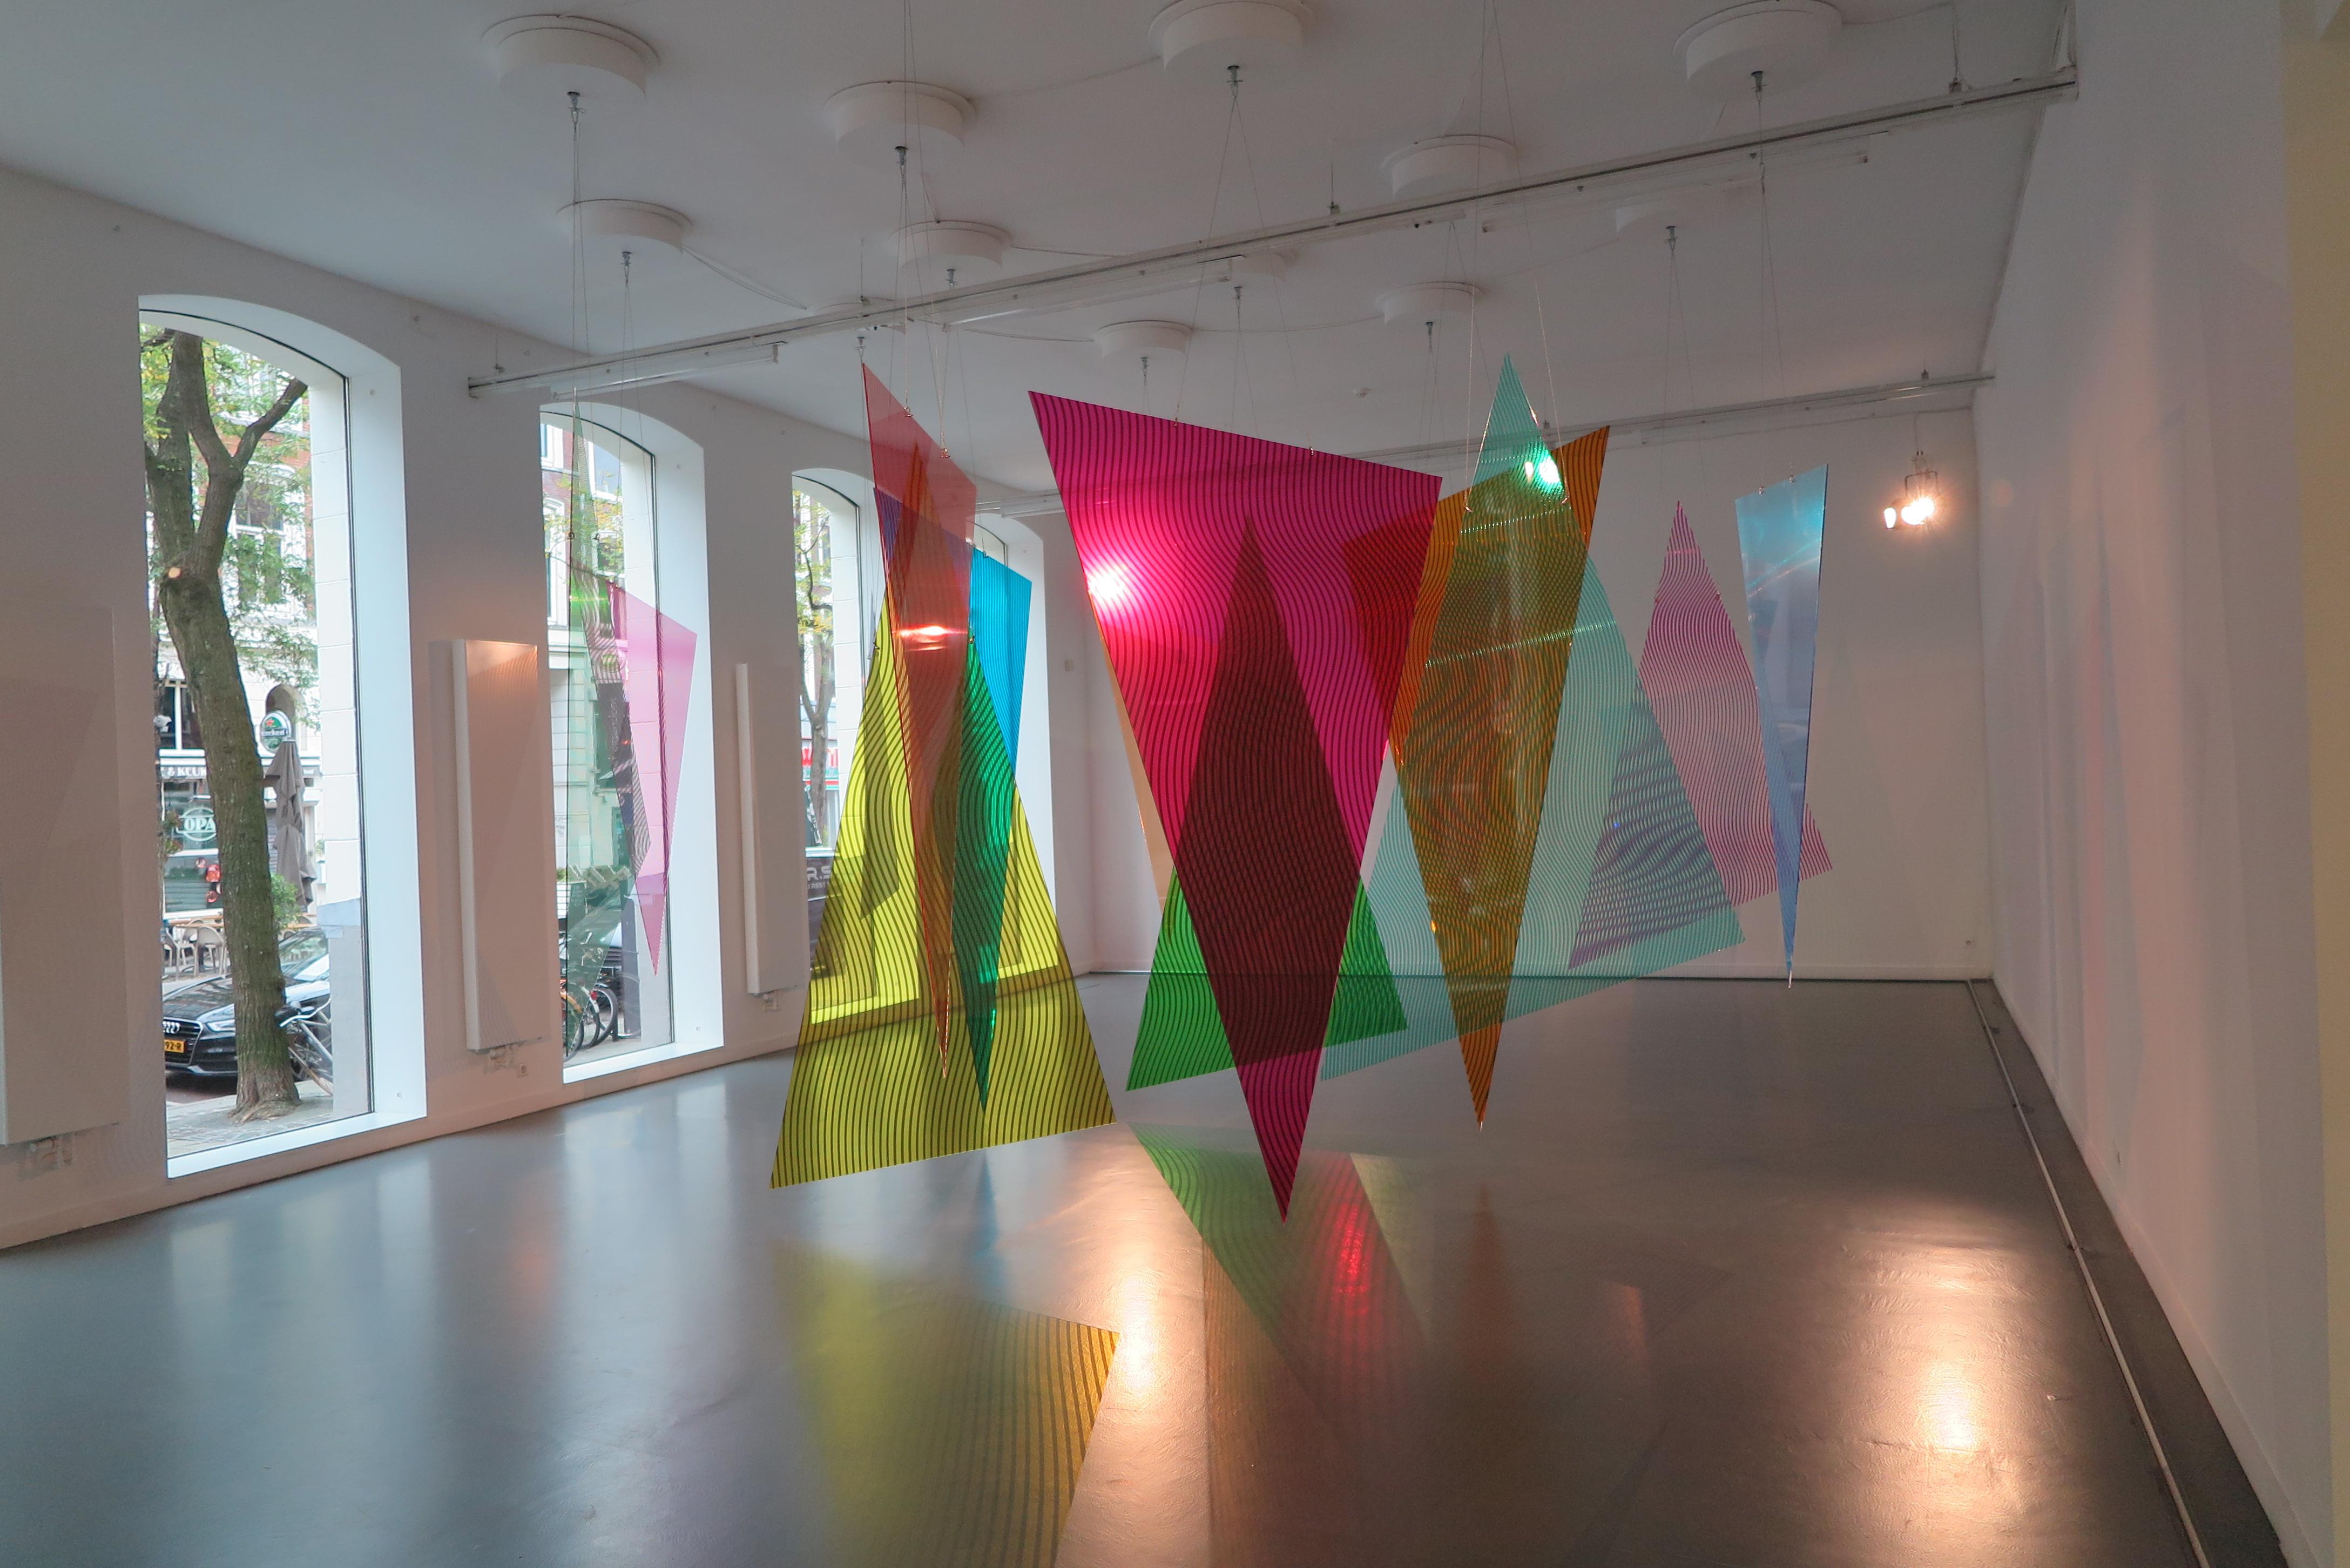 Nicky Assman - Radiant - installatie - 2015